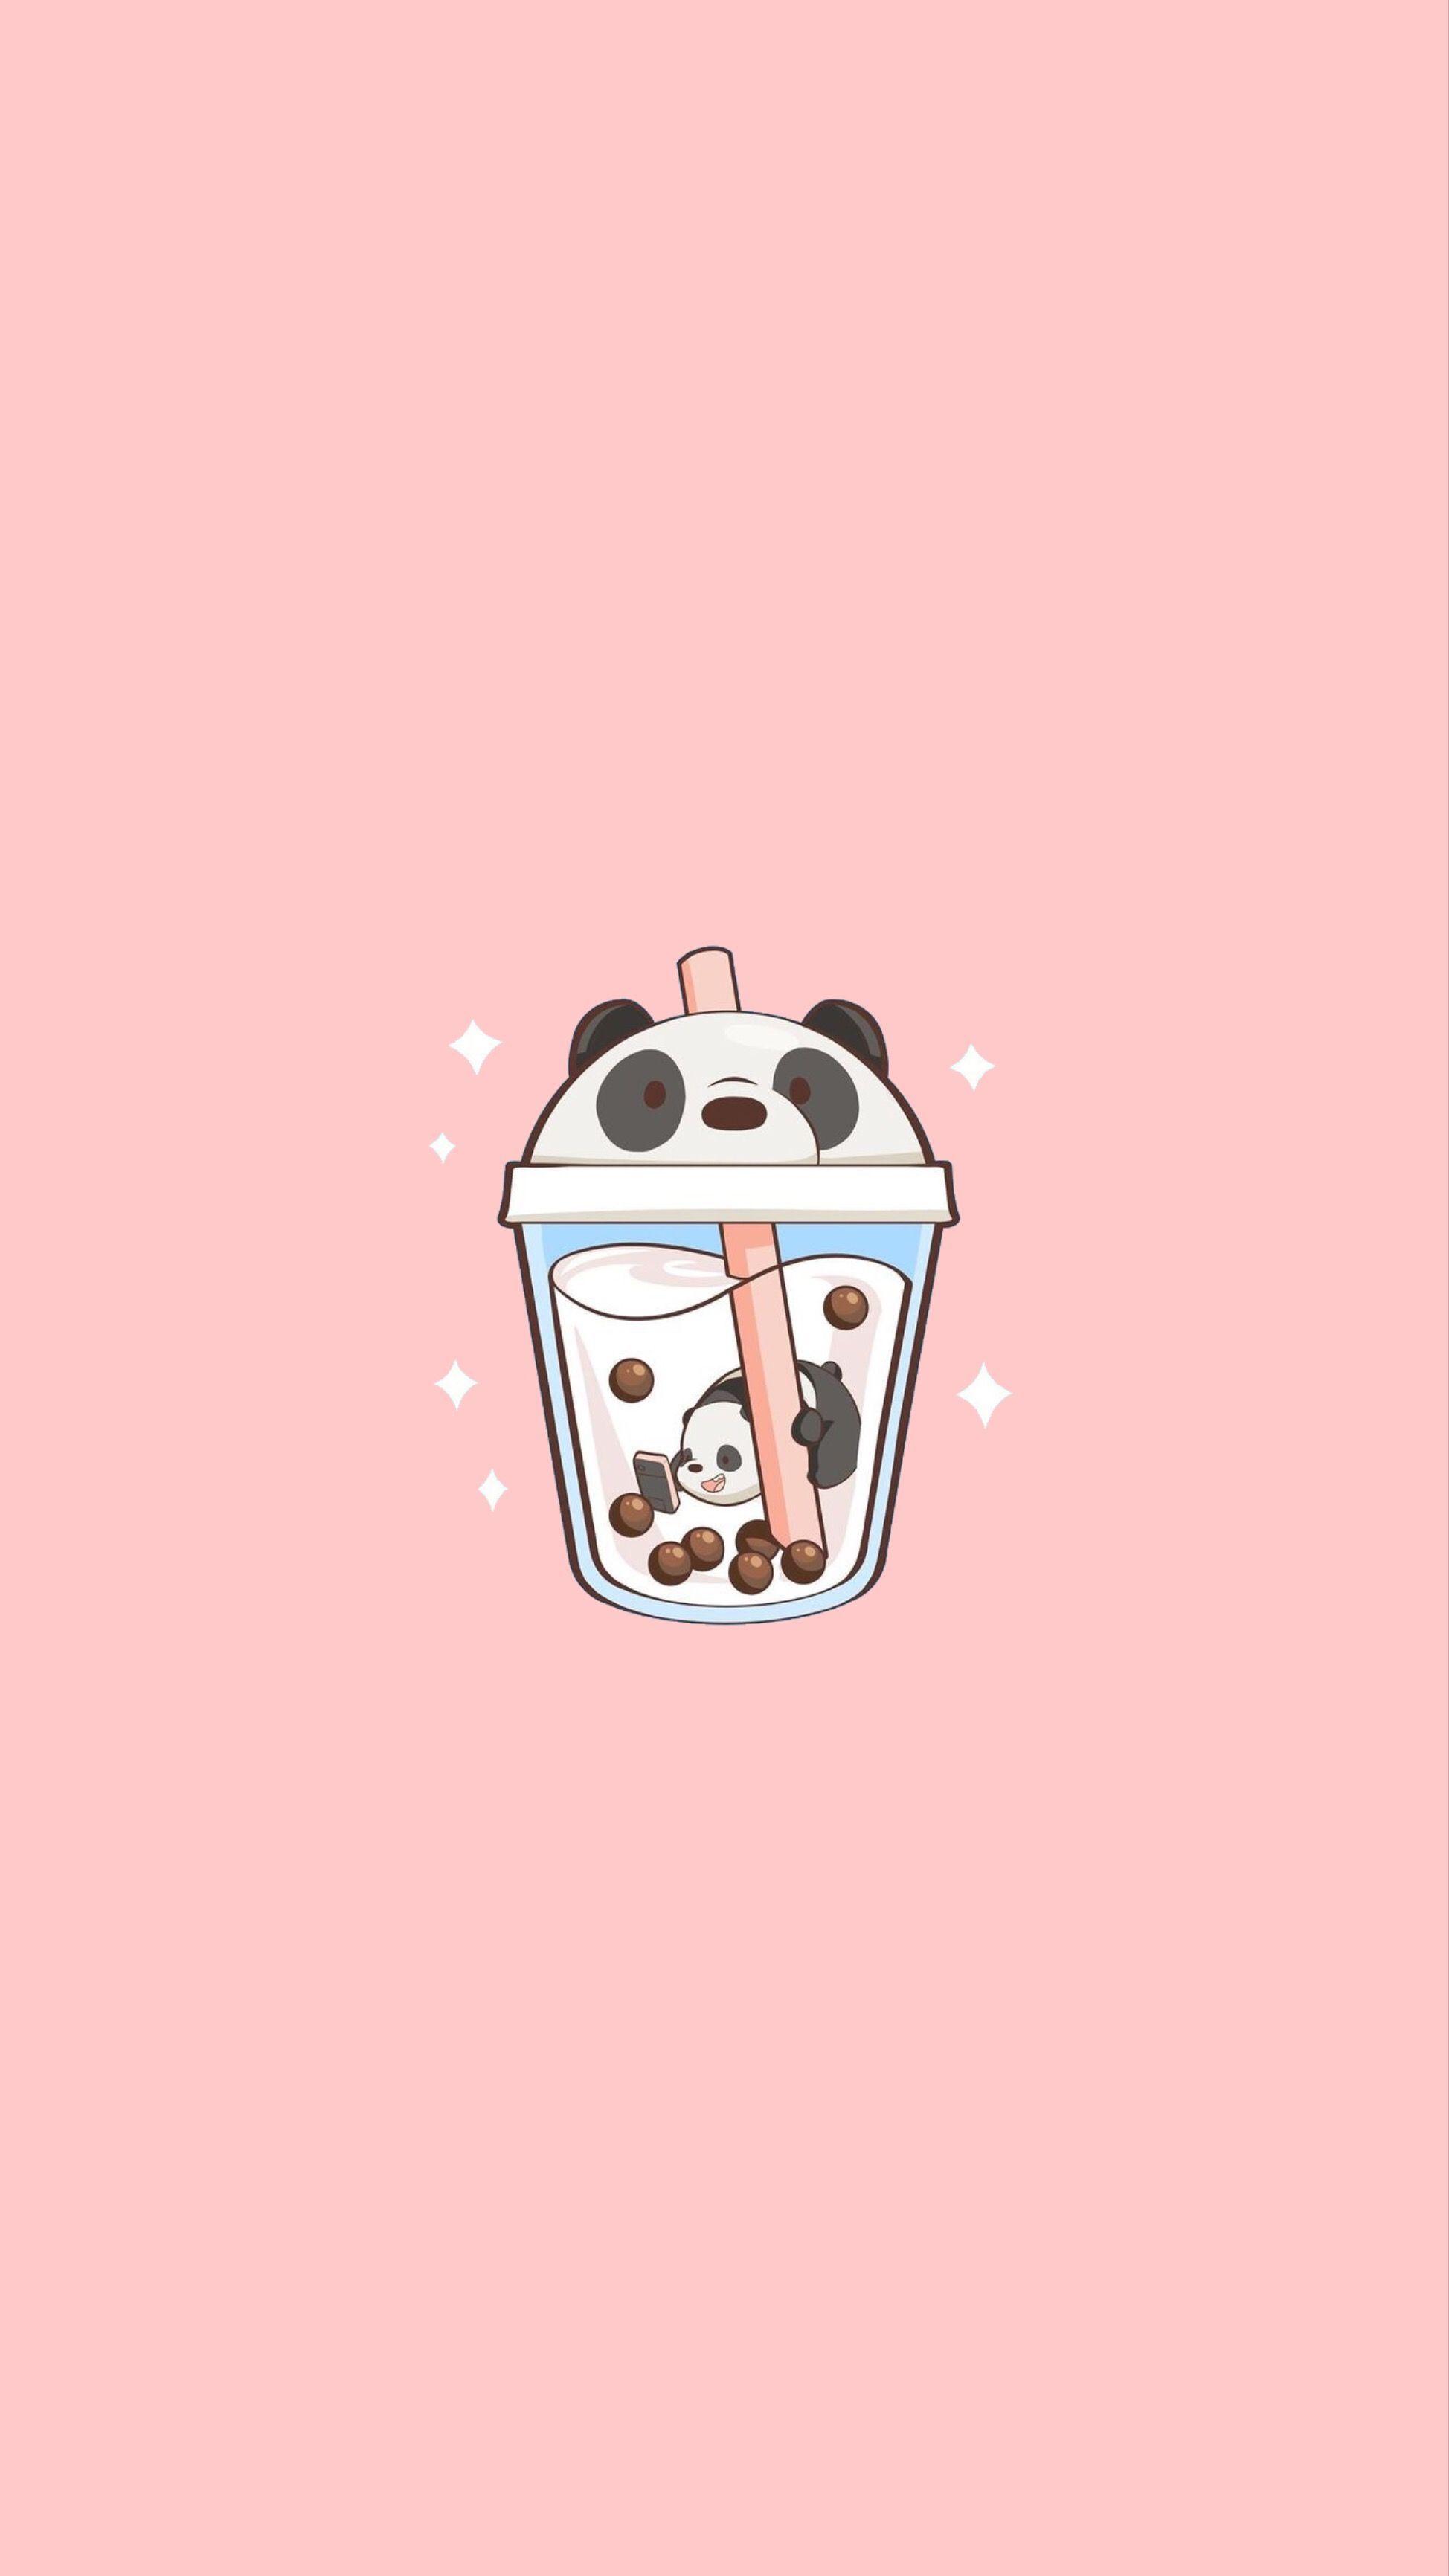 Kawaii Pink Panda Wallpapers - Wallpaper Cave